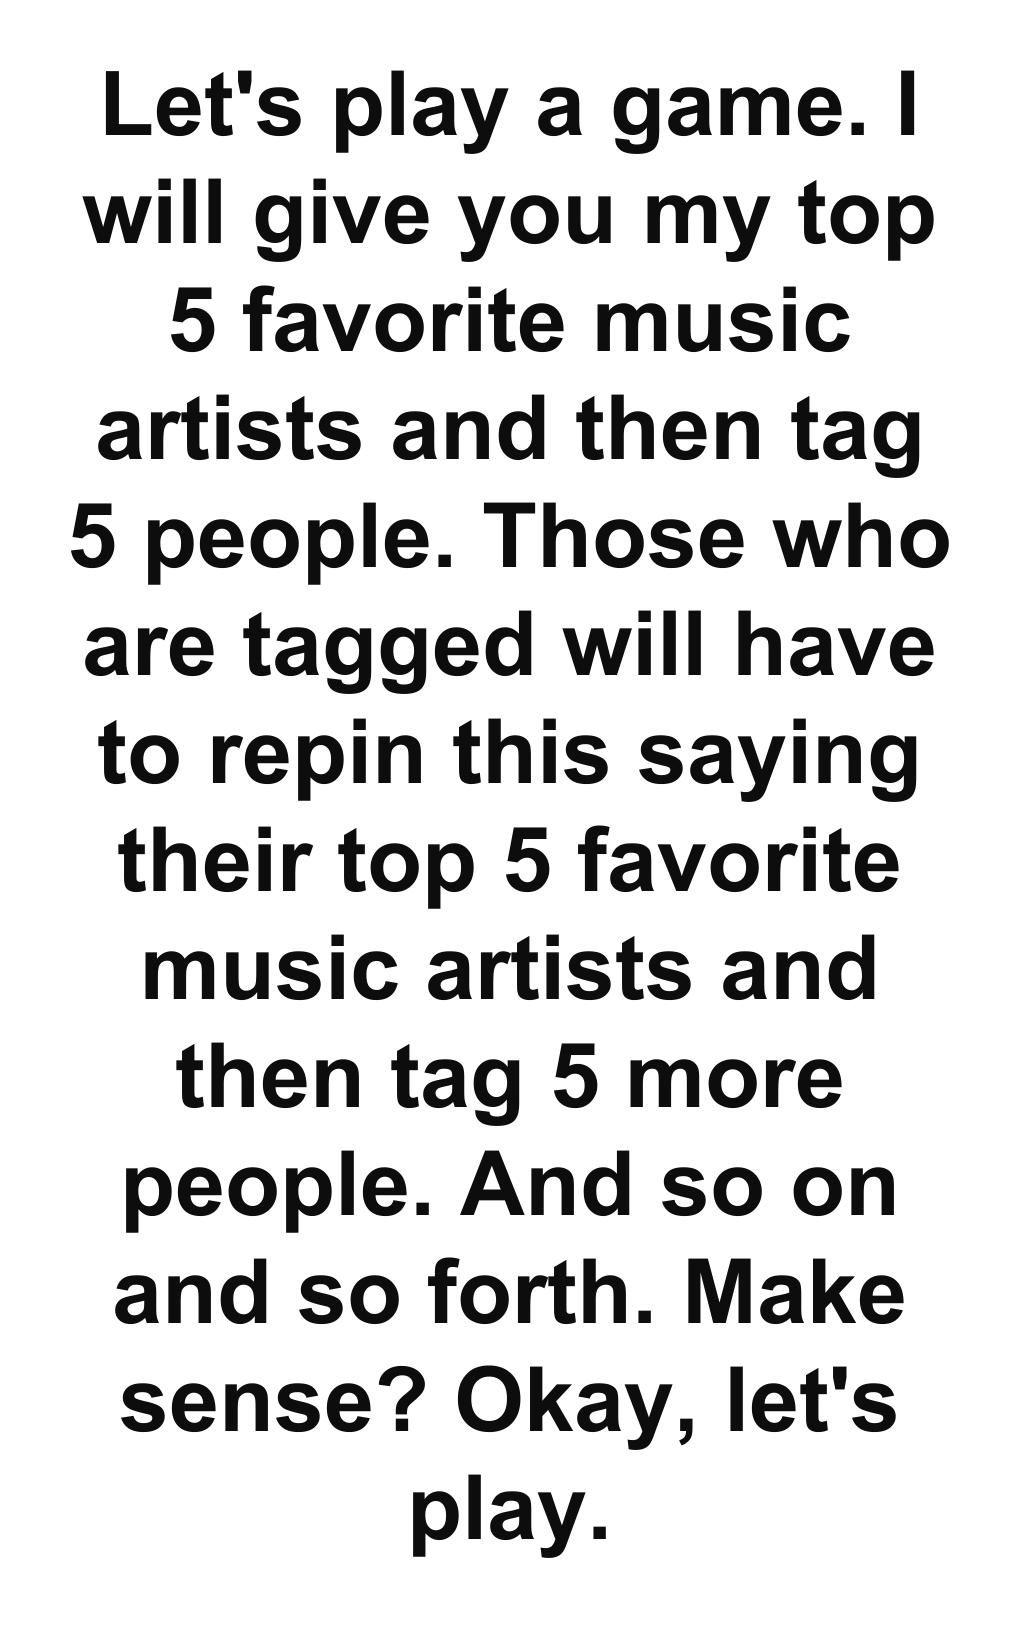 Imagine dragons, Taylor Swift, Ariana Grande, Pentatonix